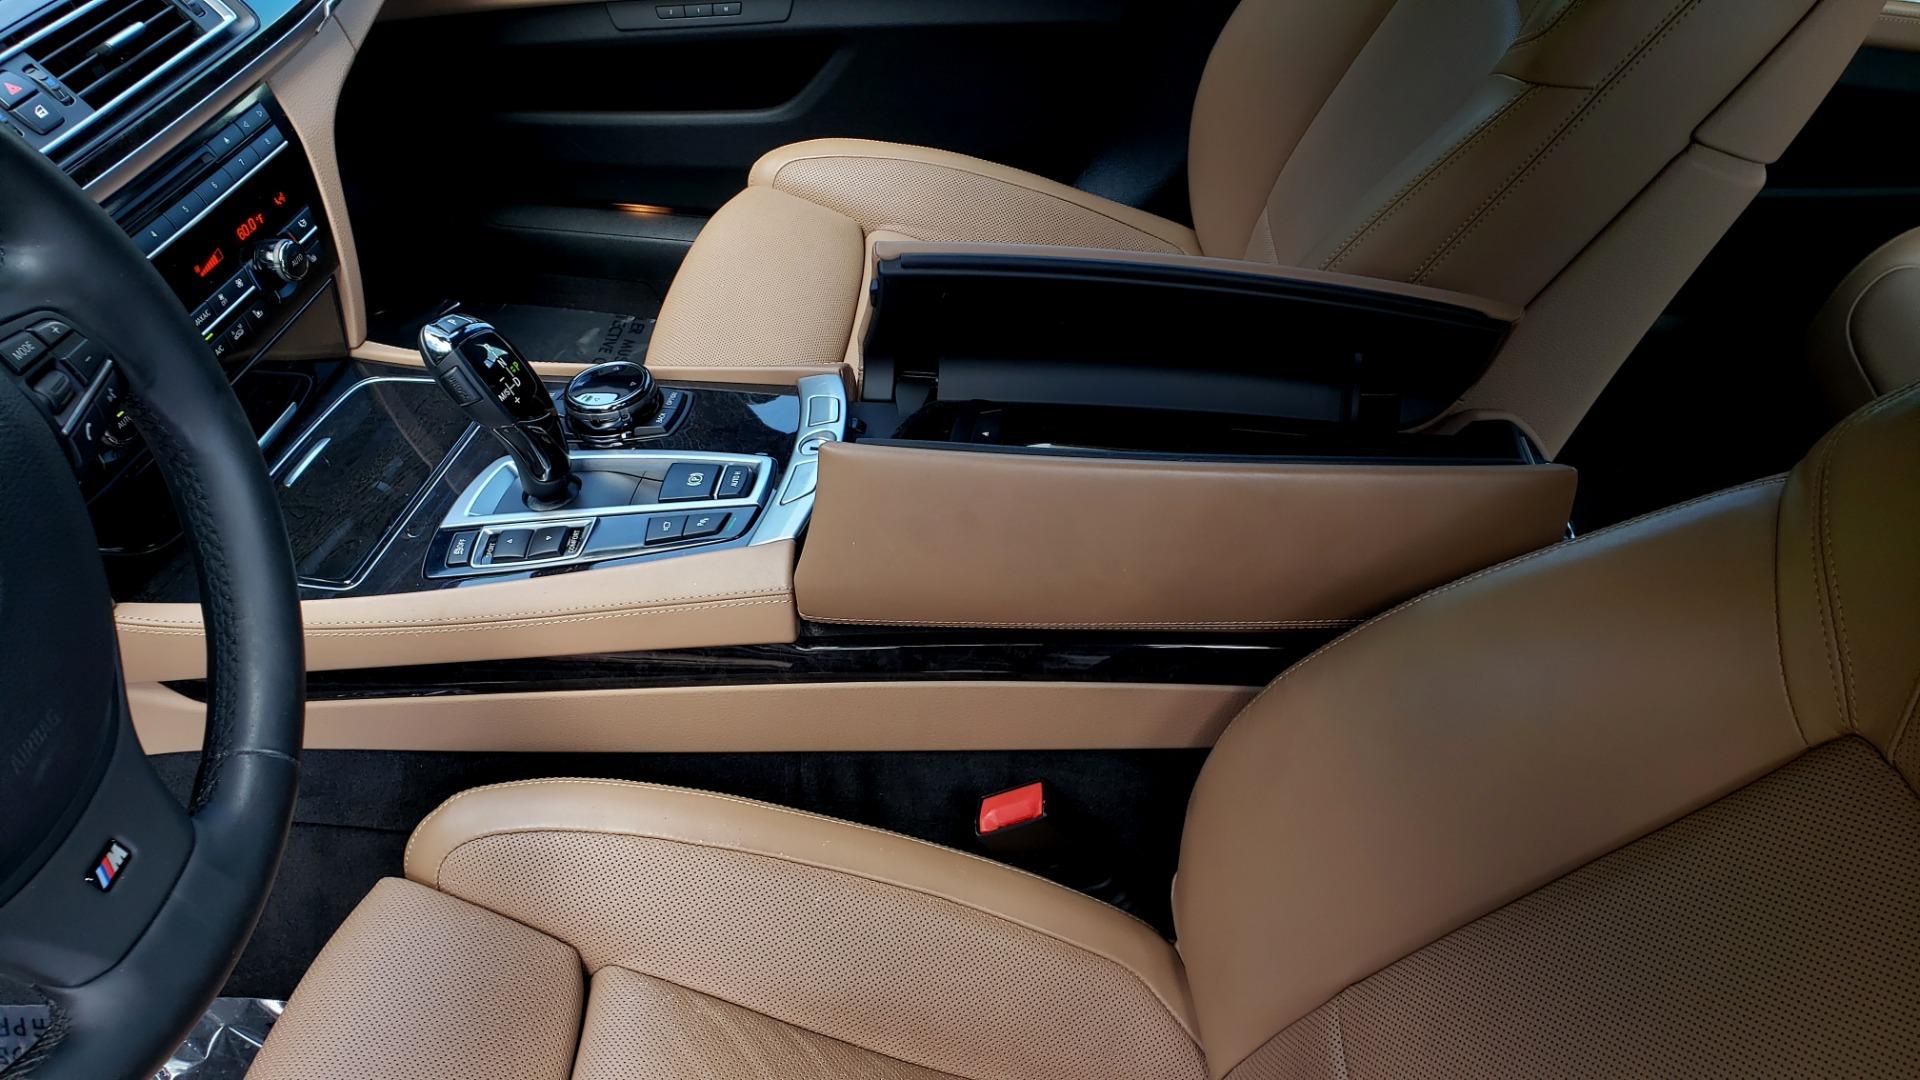 Used 2014 BMW 7 SERIES 750LI M-SPORT / EXEC PKG / DRVR ASST / LIGHTING / NAV / SUNROOF for sale Sold at Formula Imports in Charlotte NC 28227 52